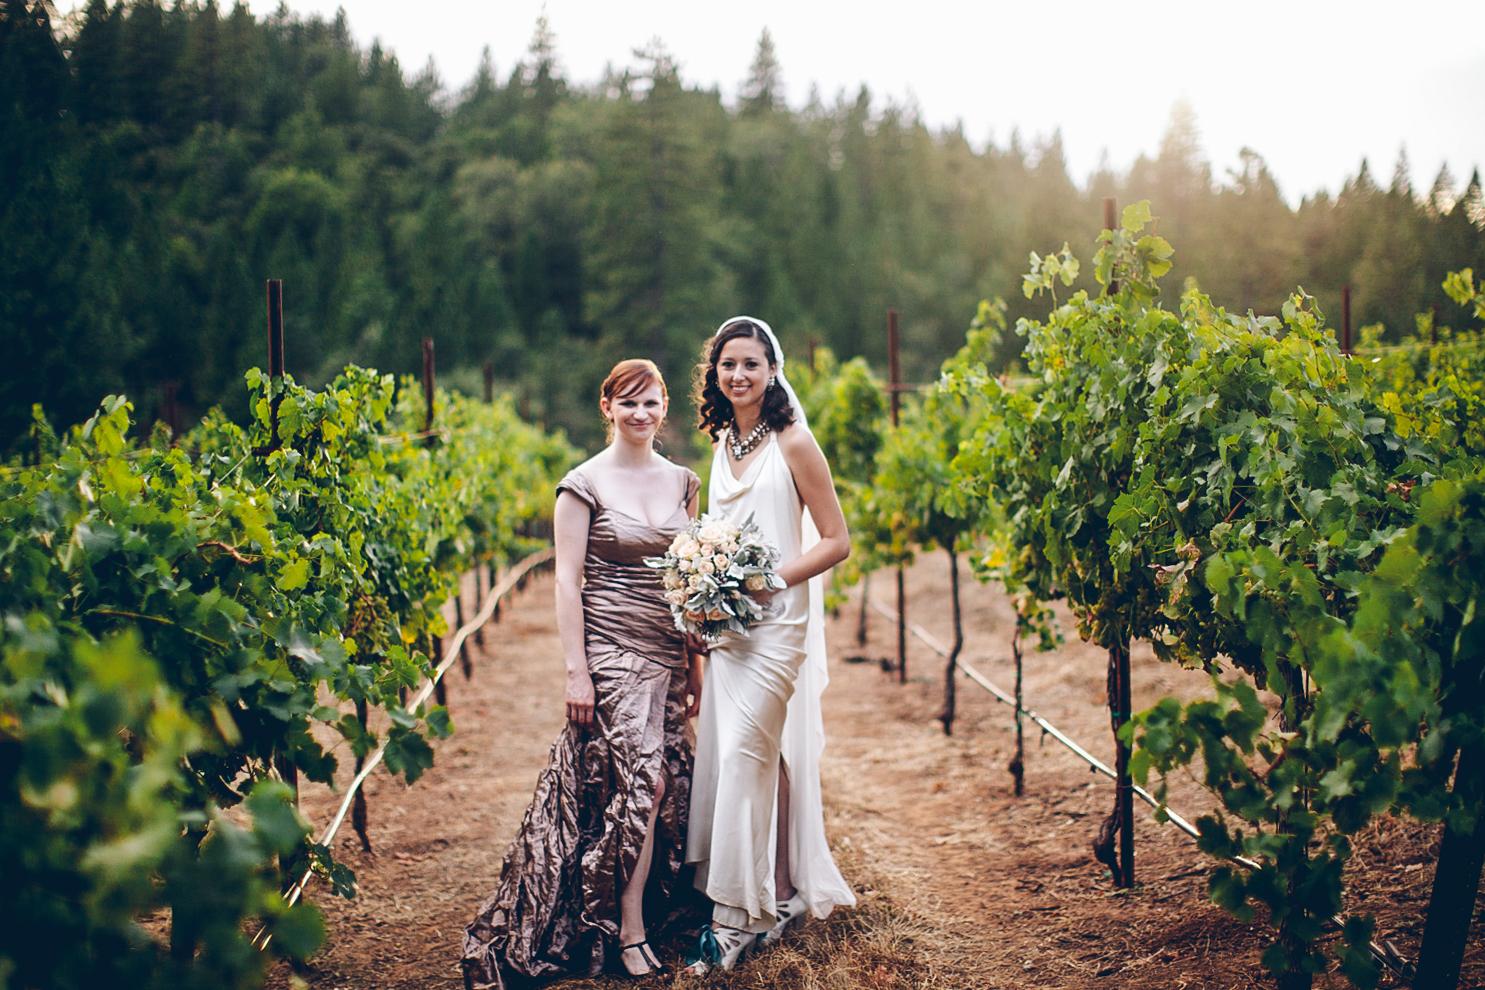 miraflores_winery_wedding_photography_ian_melissa_ebony_siovhan_bokeh_photography_63.jpg